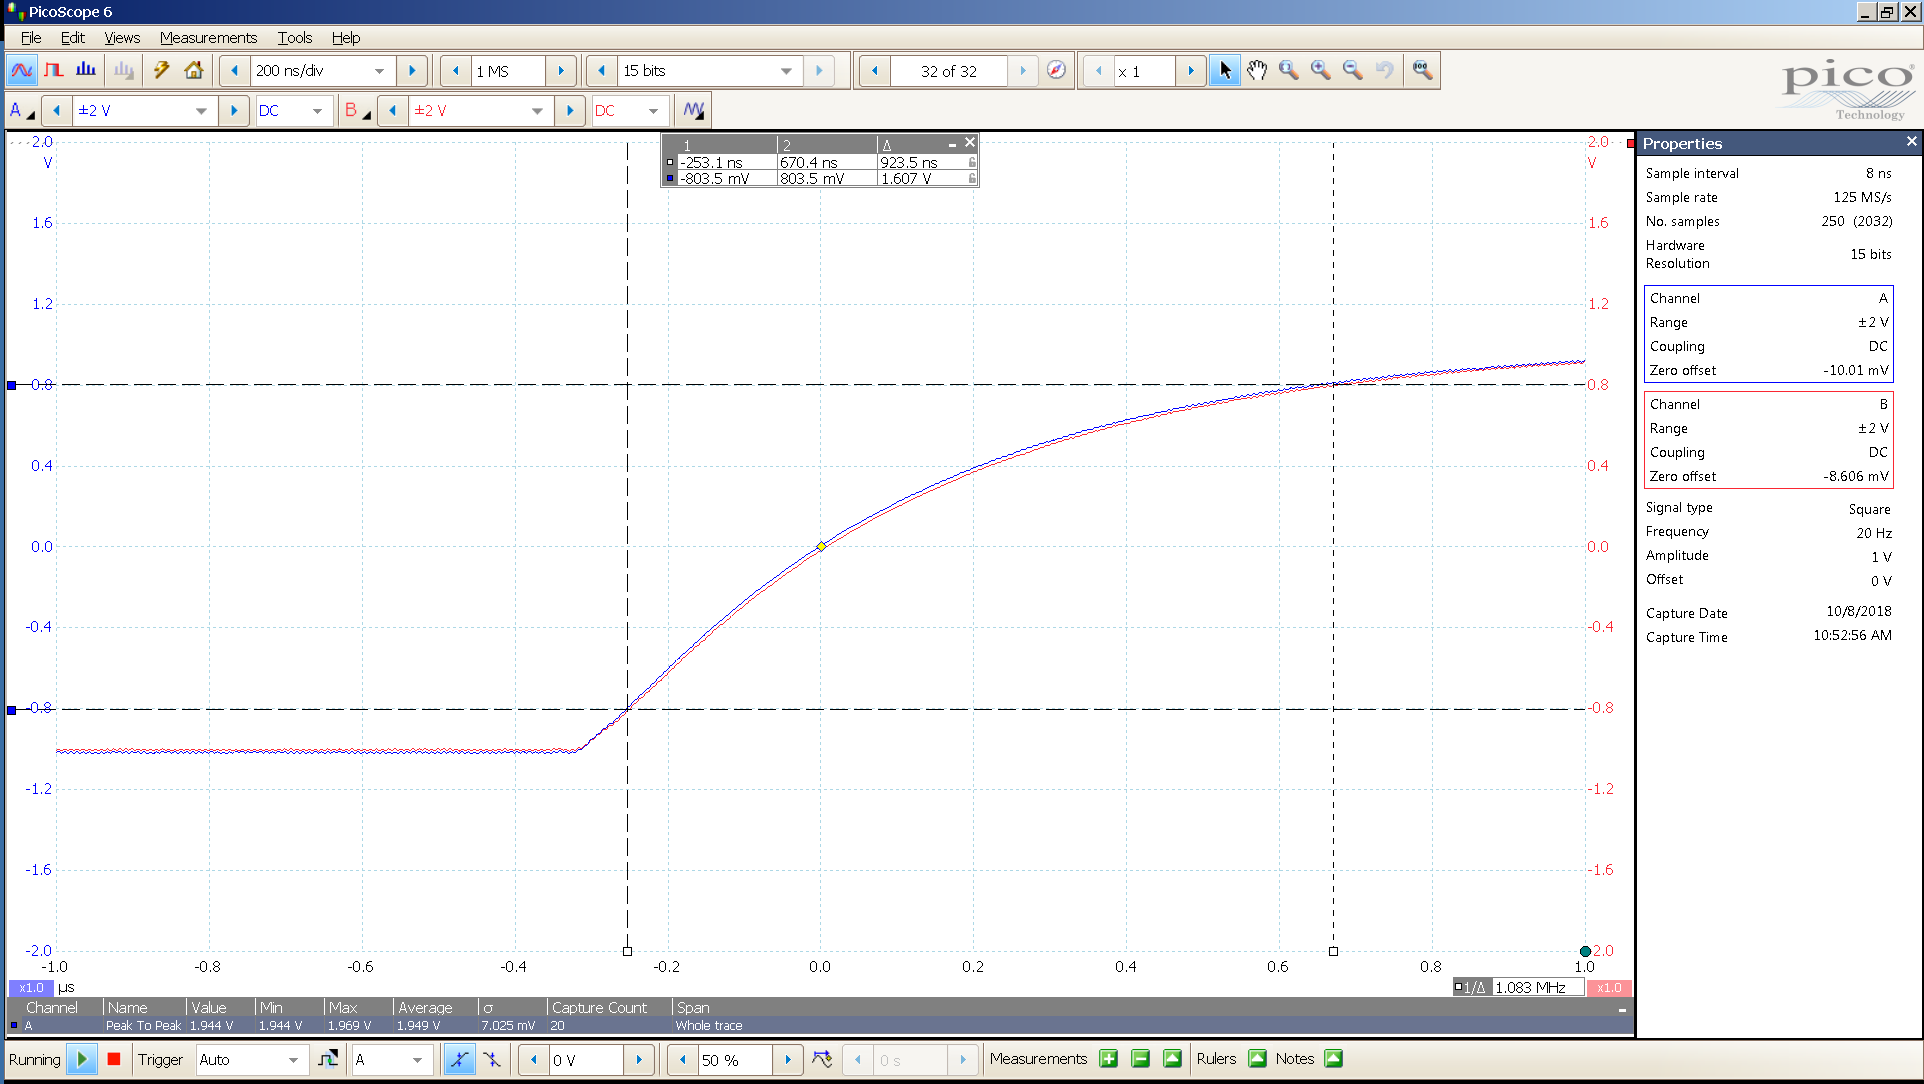 20181008 SigGen magni 3 20 Hz square 2000mVpp 200nS div 10MHz filter 300R -BW calc.png